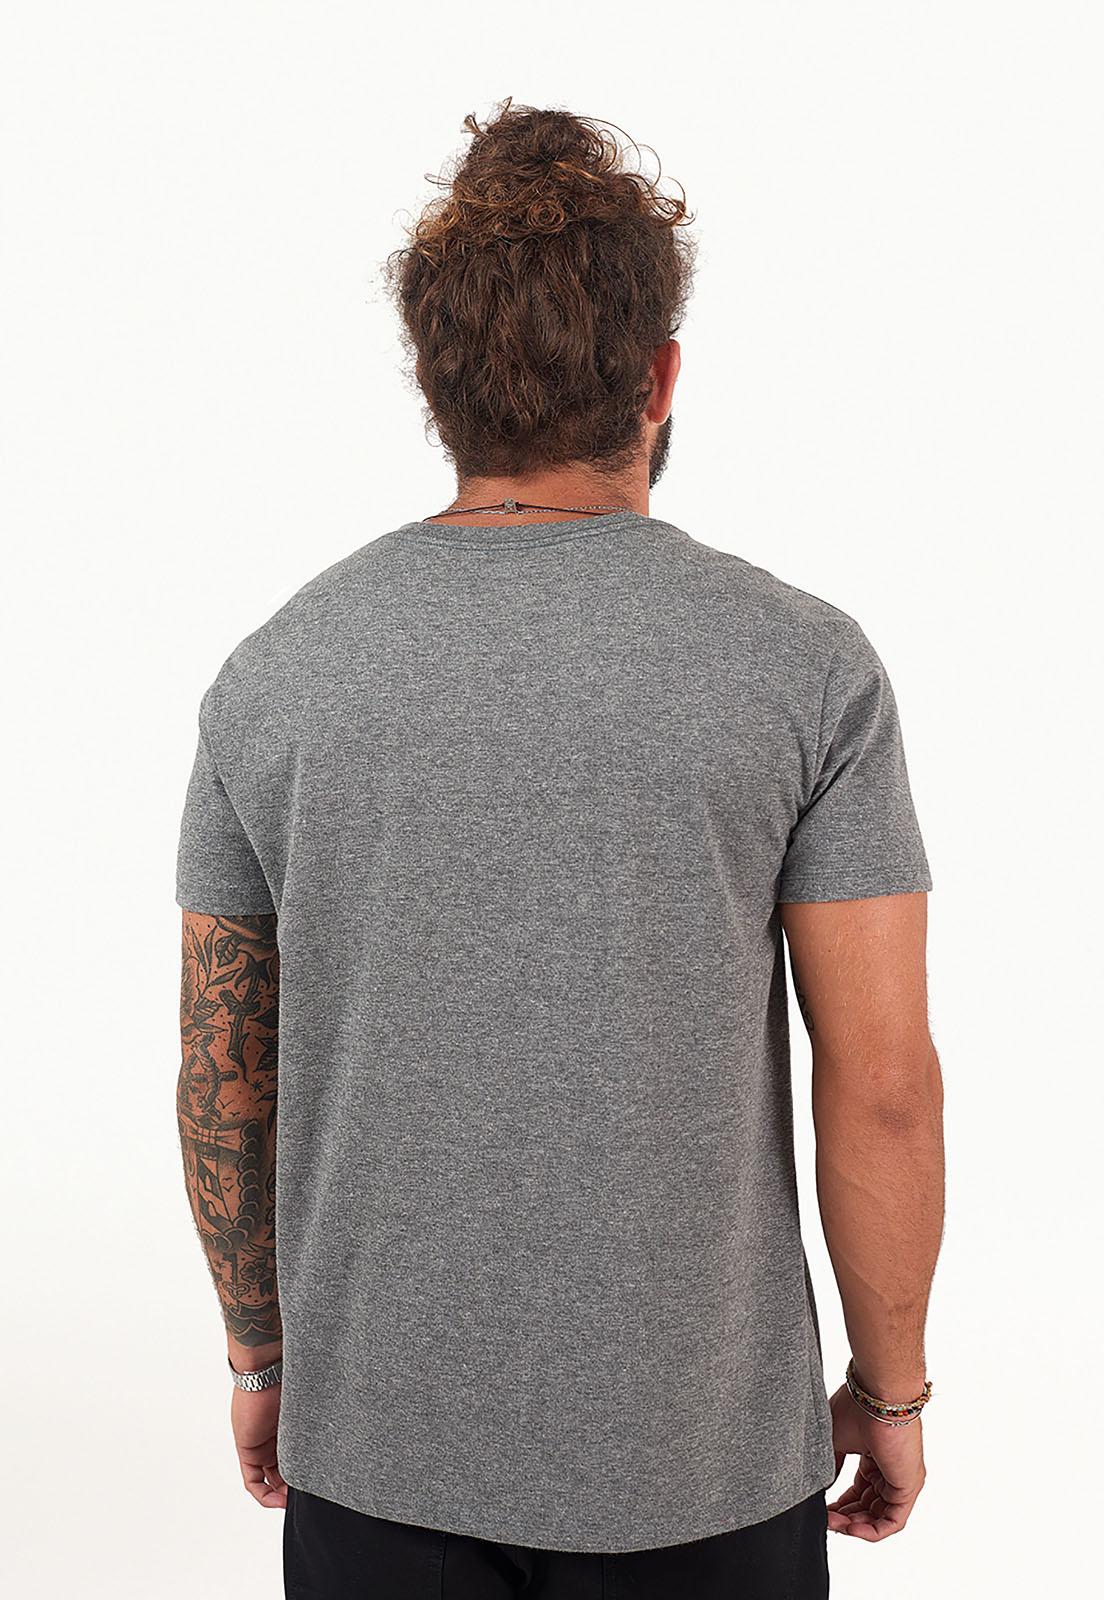 T-Shirt Rio nuvens Mescla melty  - melty surf & Co.